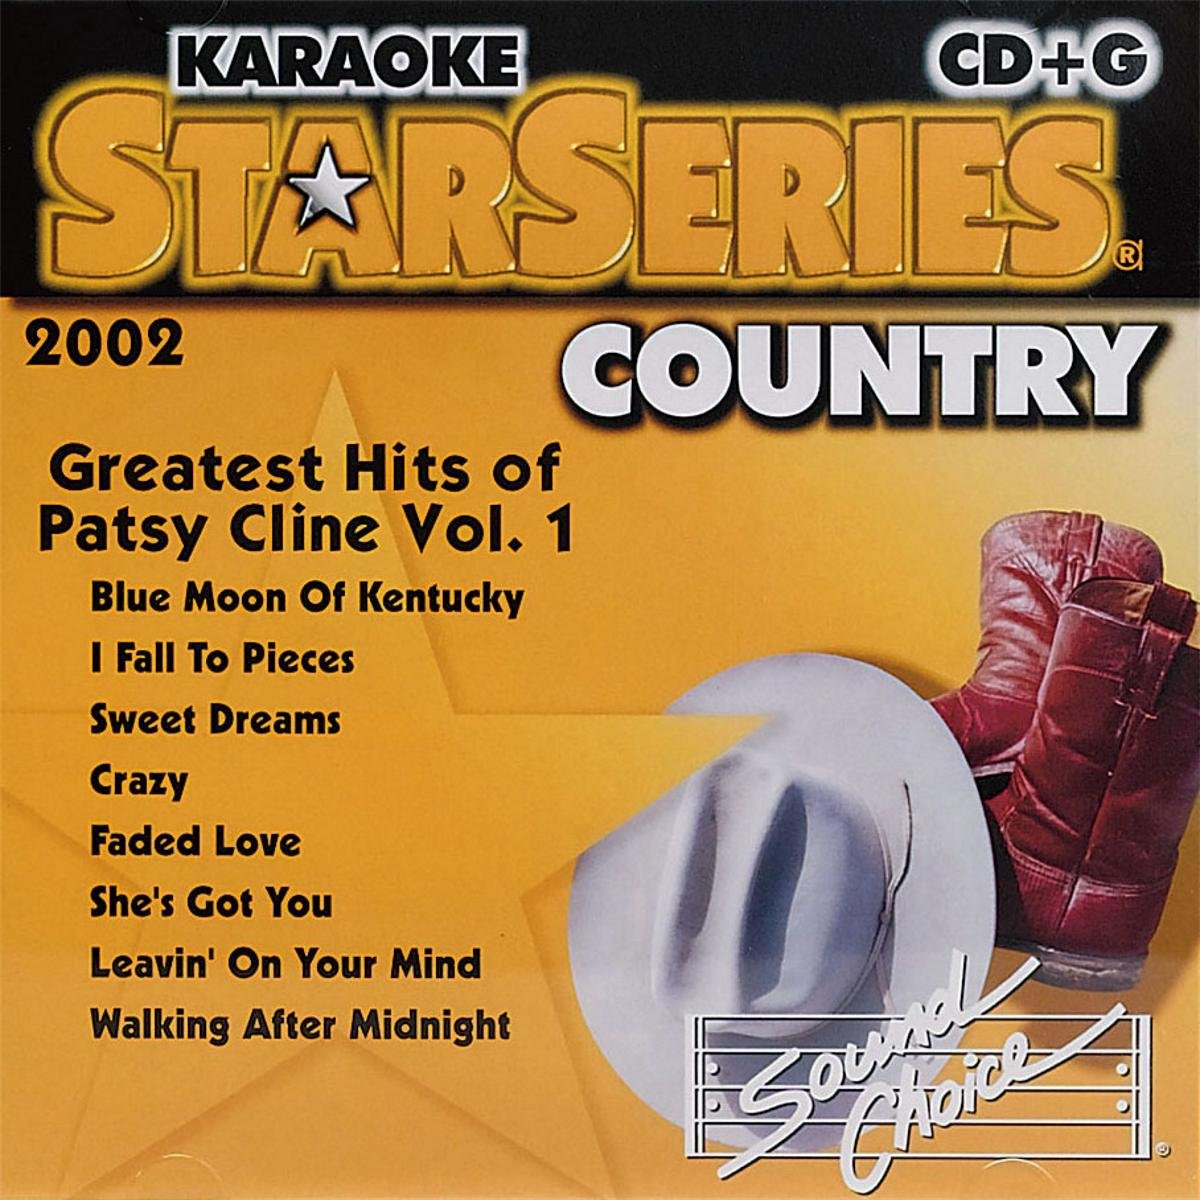 Karaoke CDG - Greatest Hits Of Patsy Cline Vol. 1